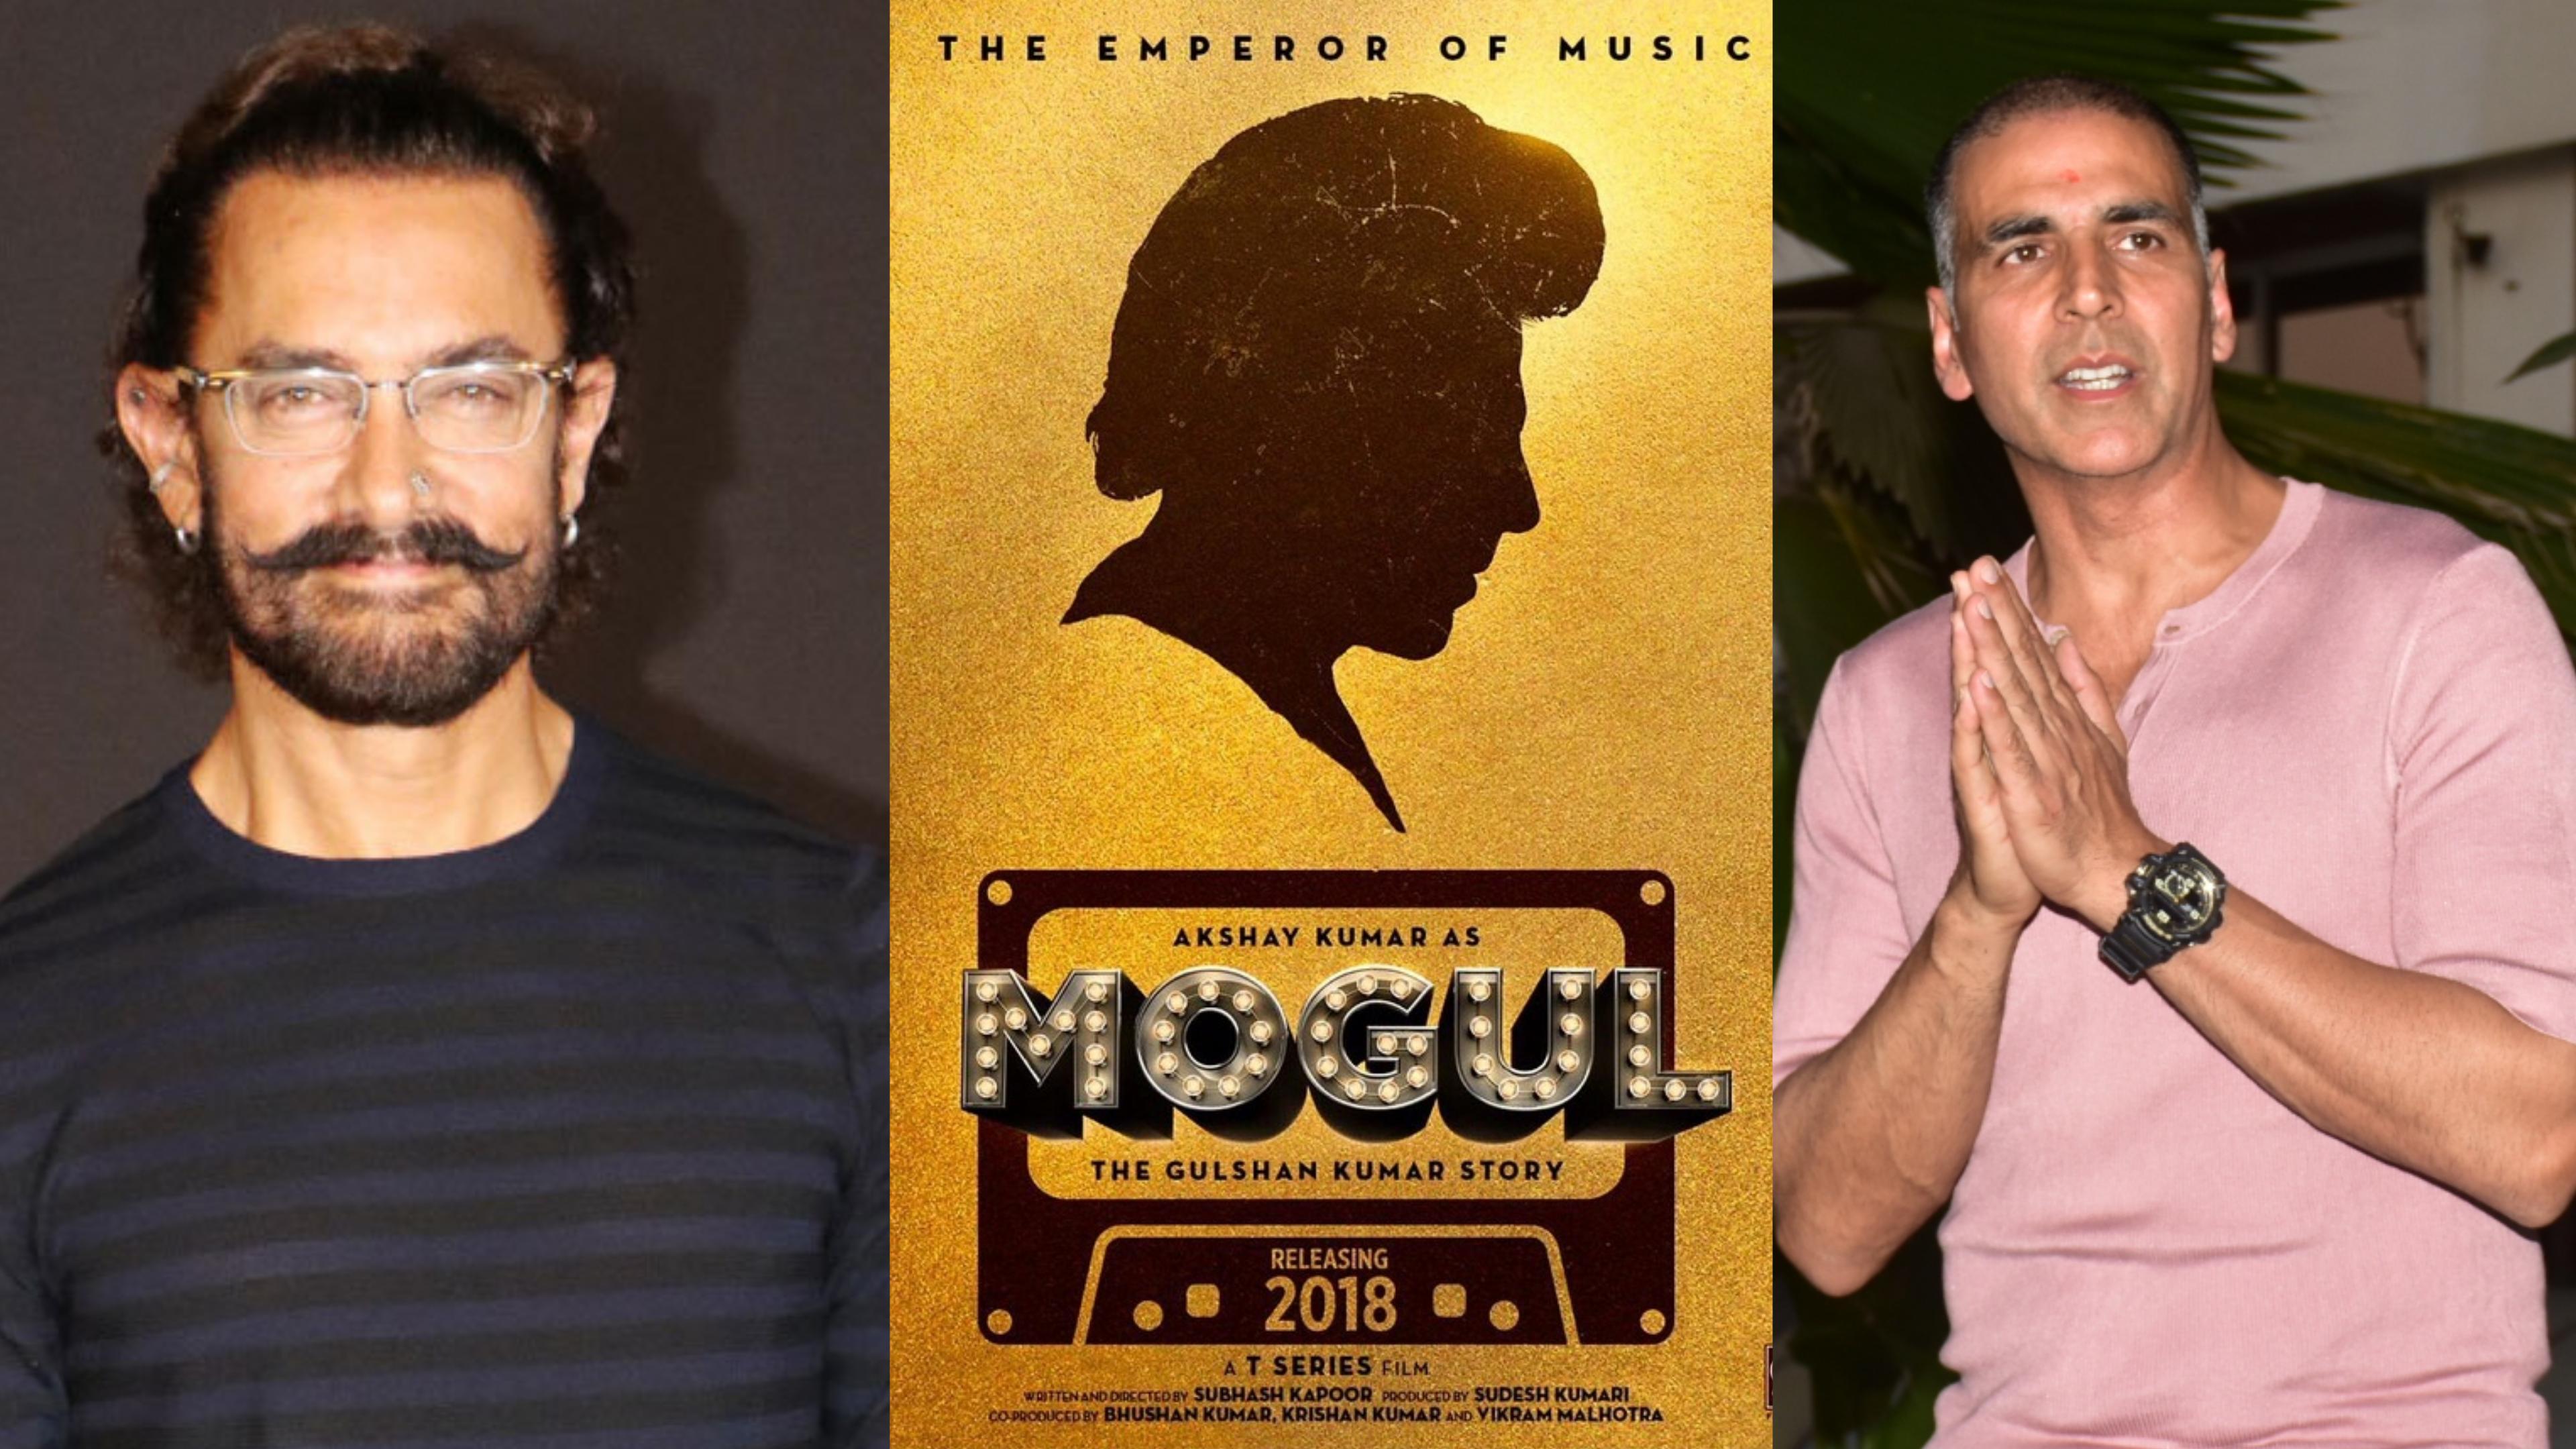 Aamir replaces Akshay Mogul